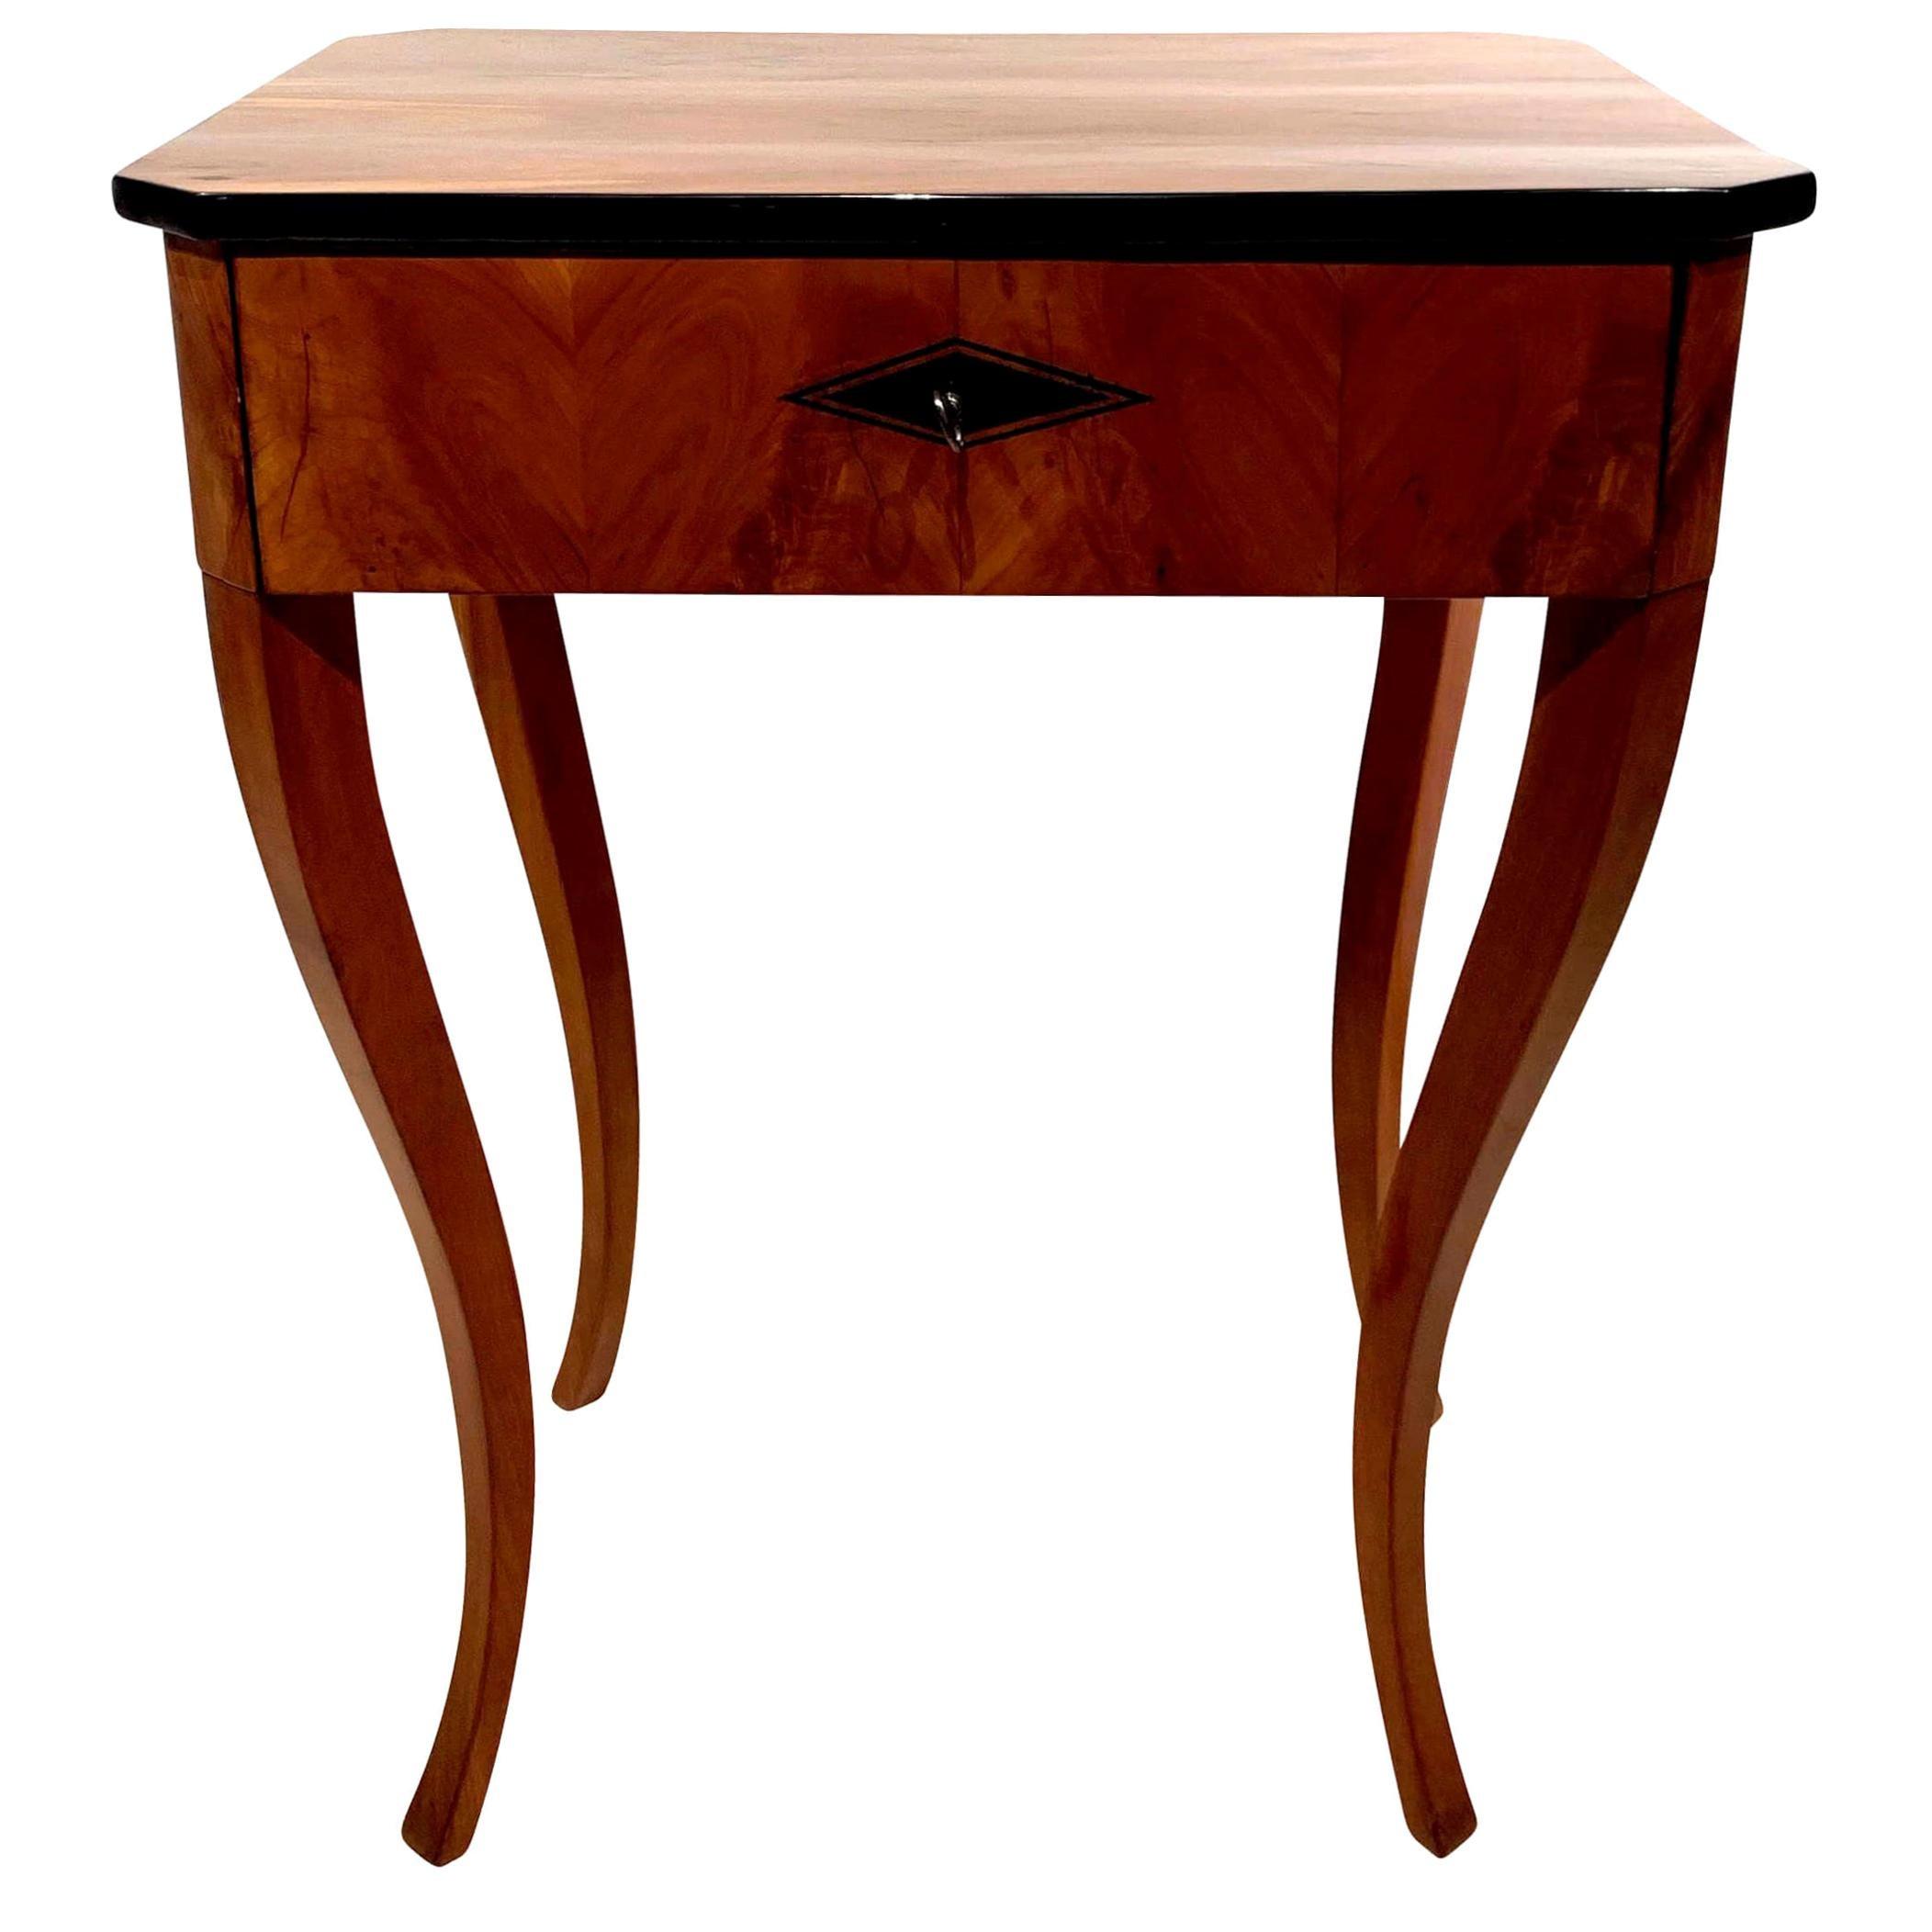 Biedermeier Side Table with Drawer, Cherry Veneer, South Germany, circa 1830